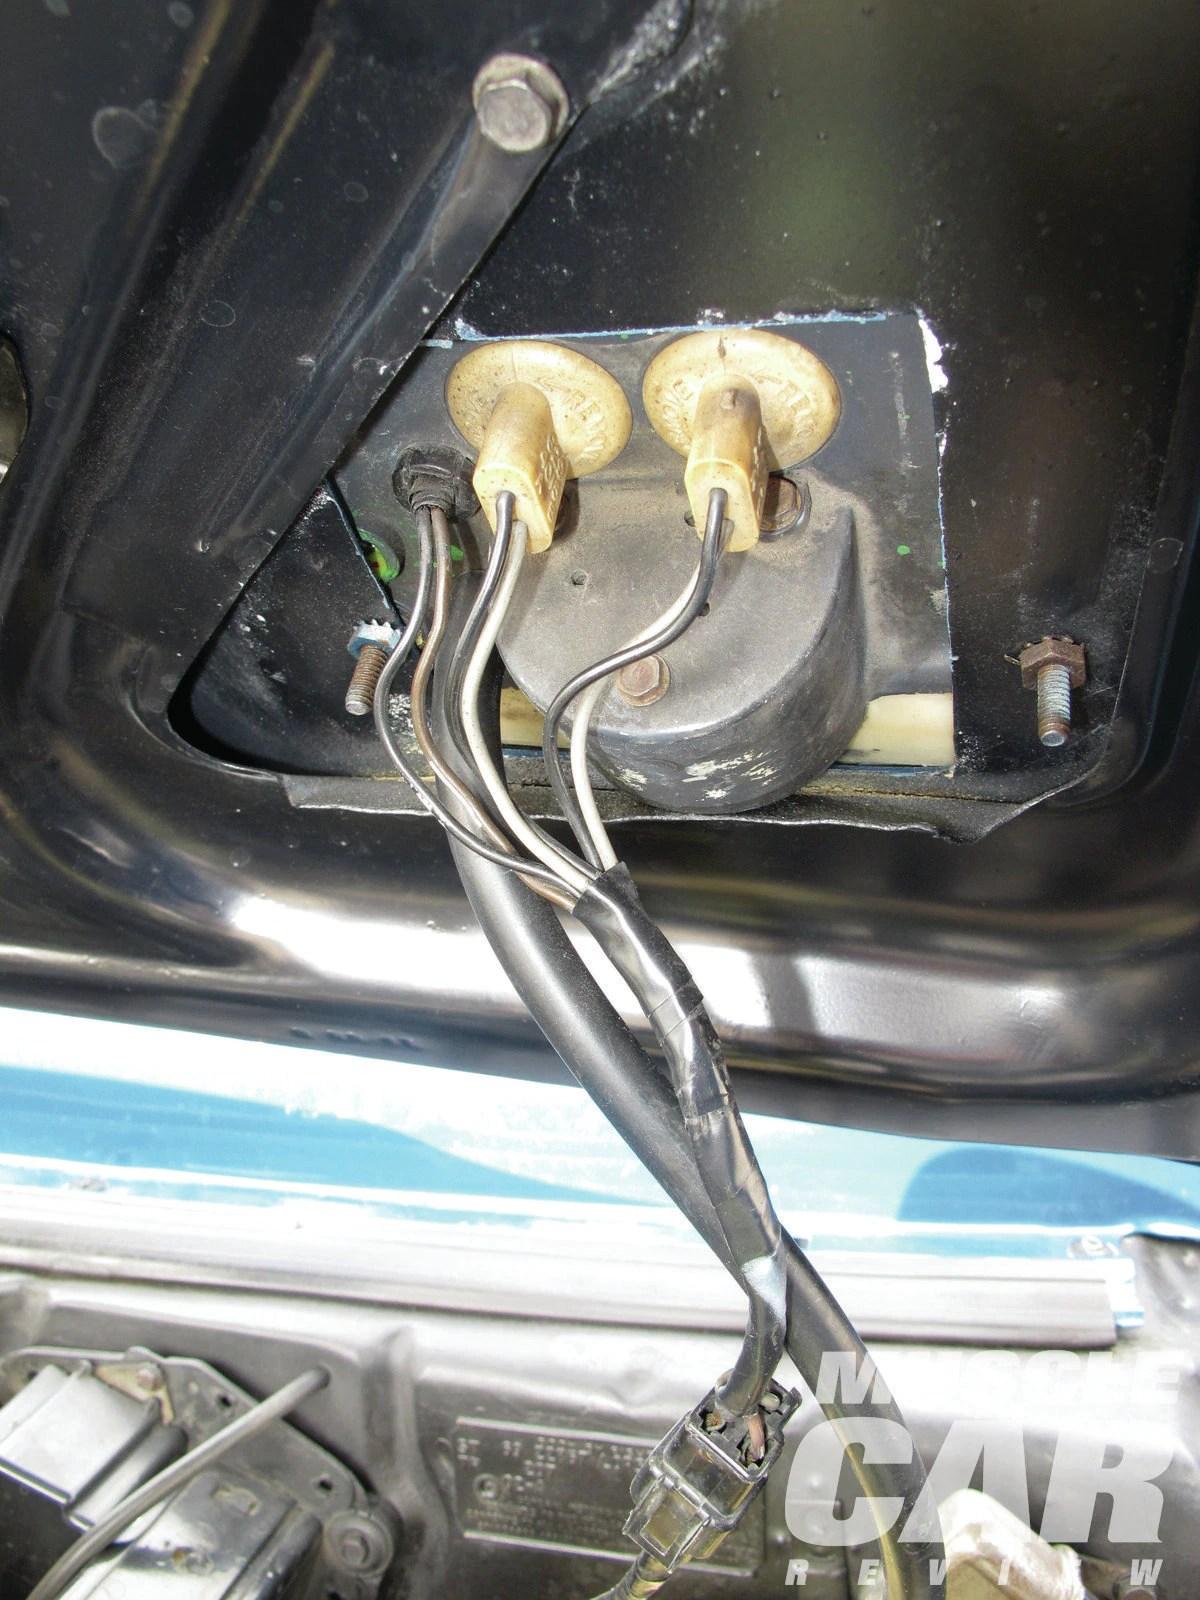 hight resolution of 1968 pontiac gto hood tach wiring diagram electrical wiring diagrams rh wiringforall today 1967 pontiac le